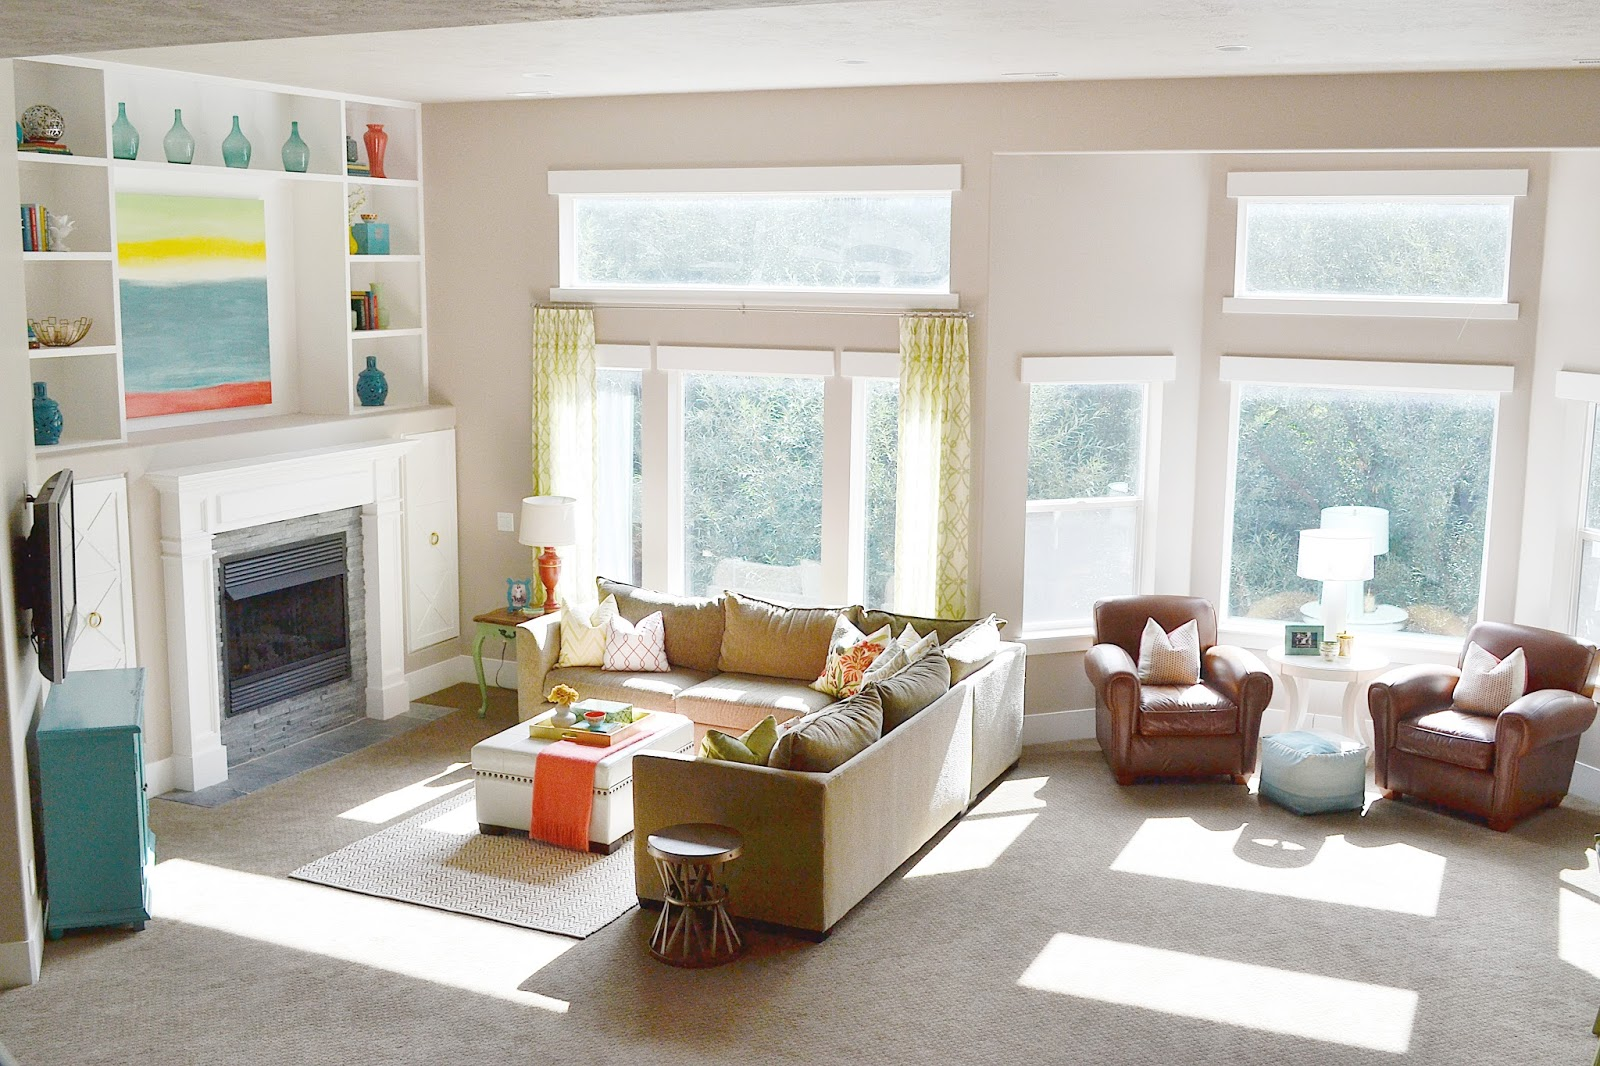 My New Home Basement Family Room Sita Montgomery Interiors